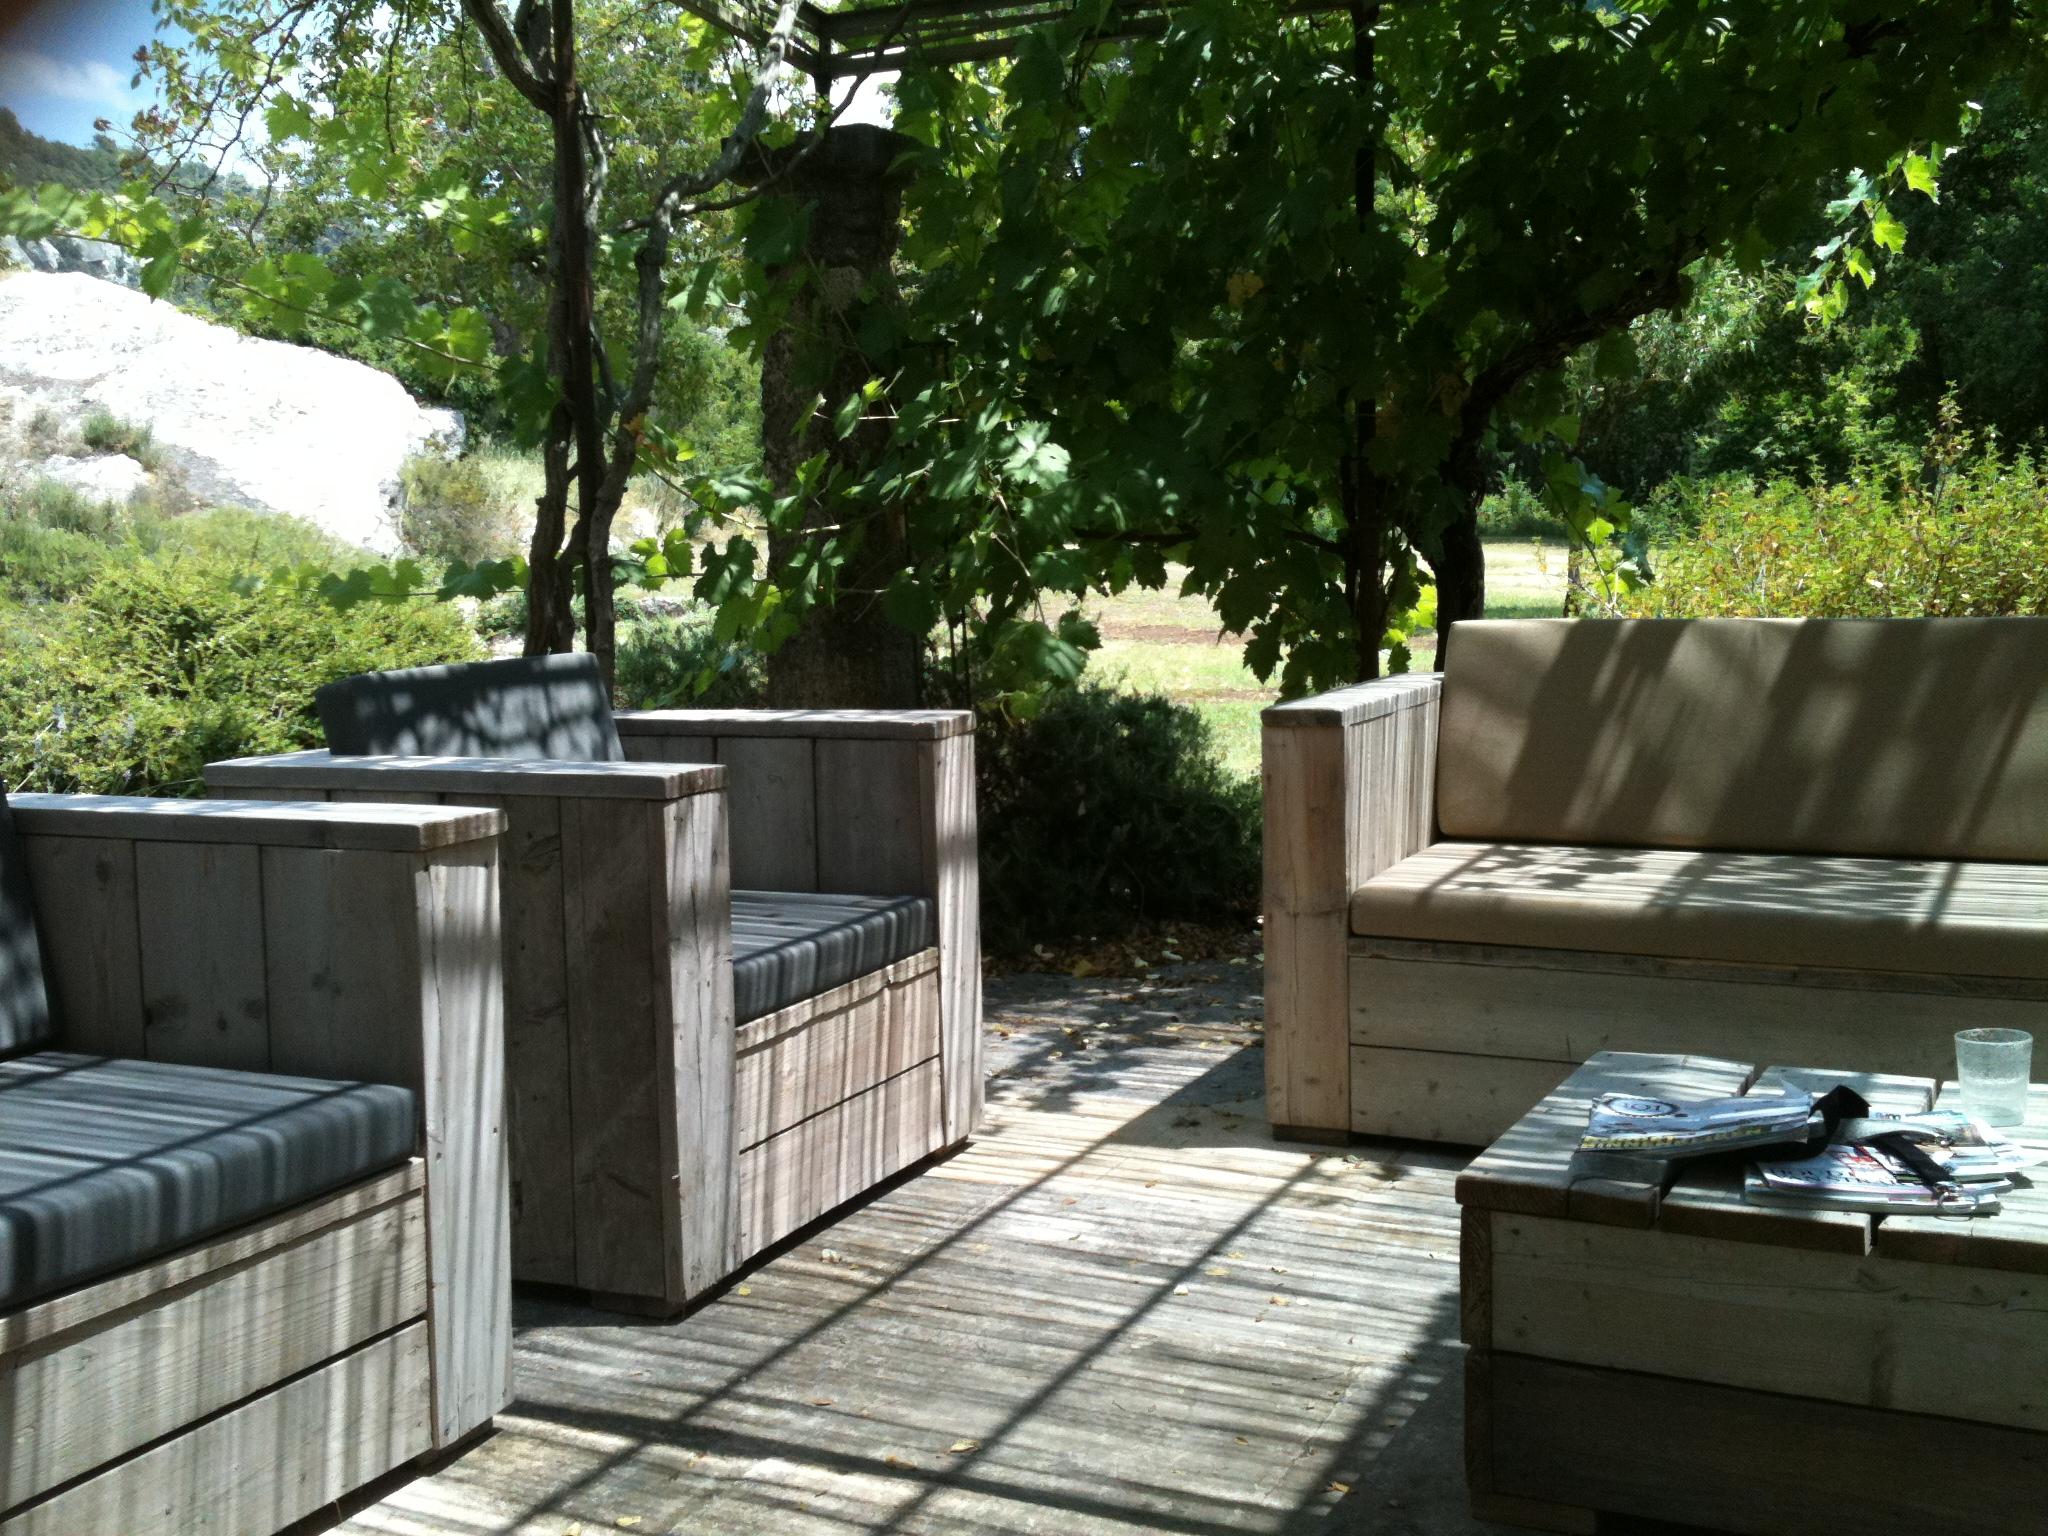 Salon de jardin exterieur en bois - Mailleraye.fr jardin